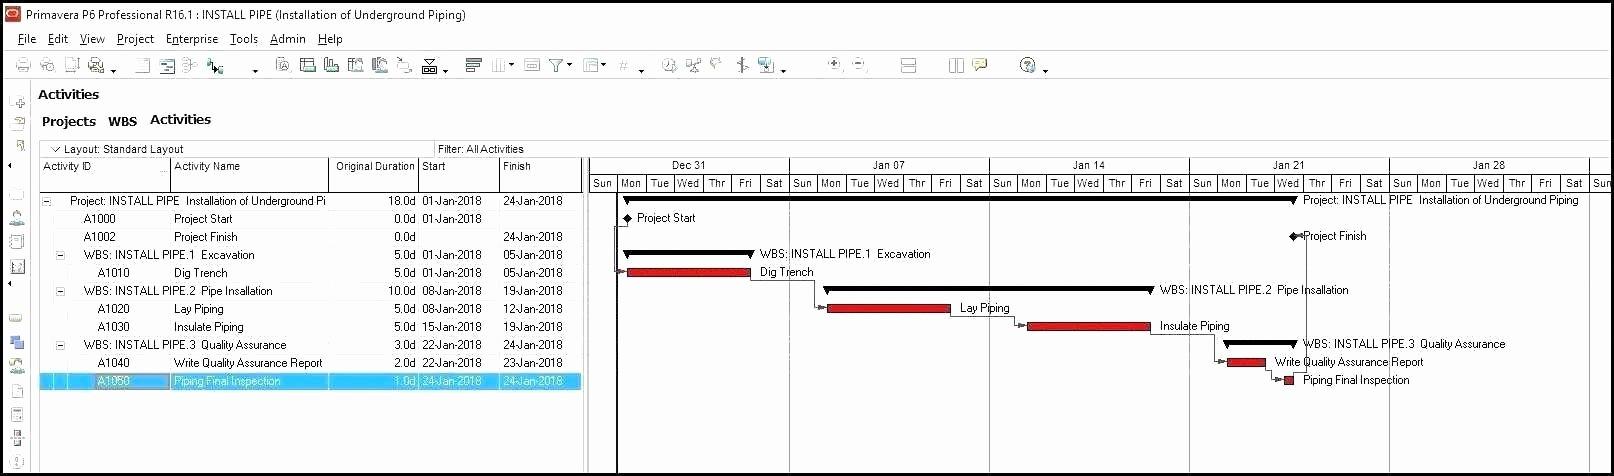 Lesson Plan Template Google Doc Unique Lesson Plan Sample In Word